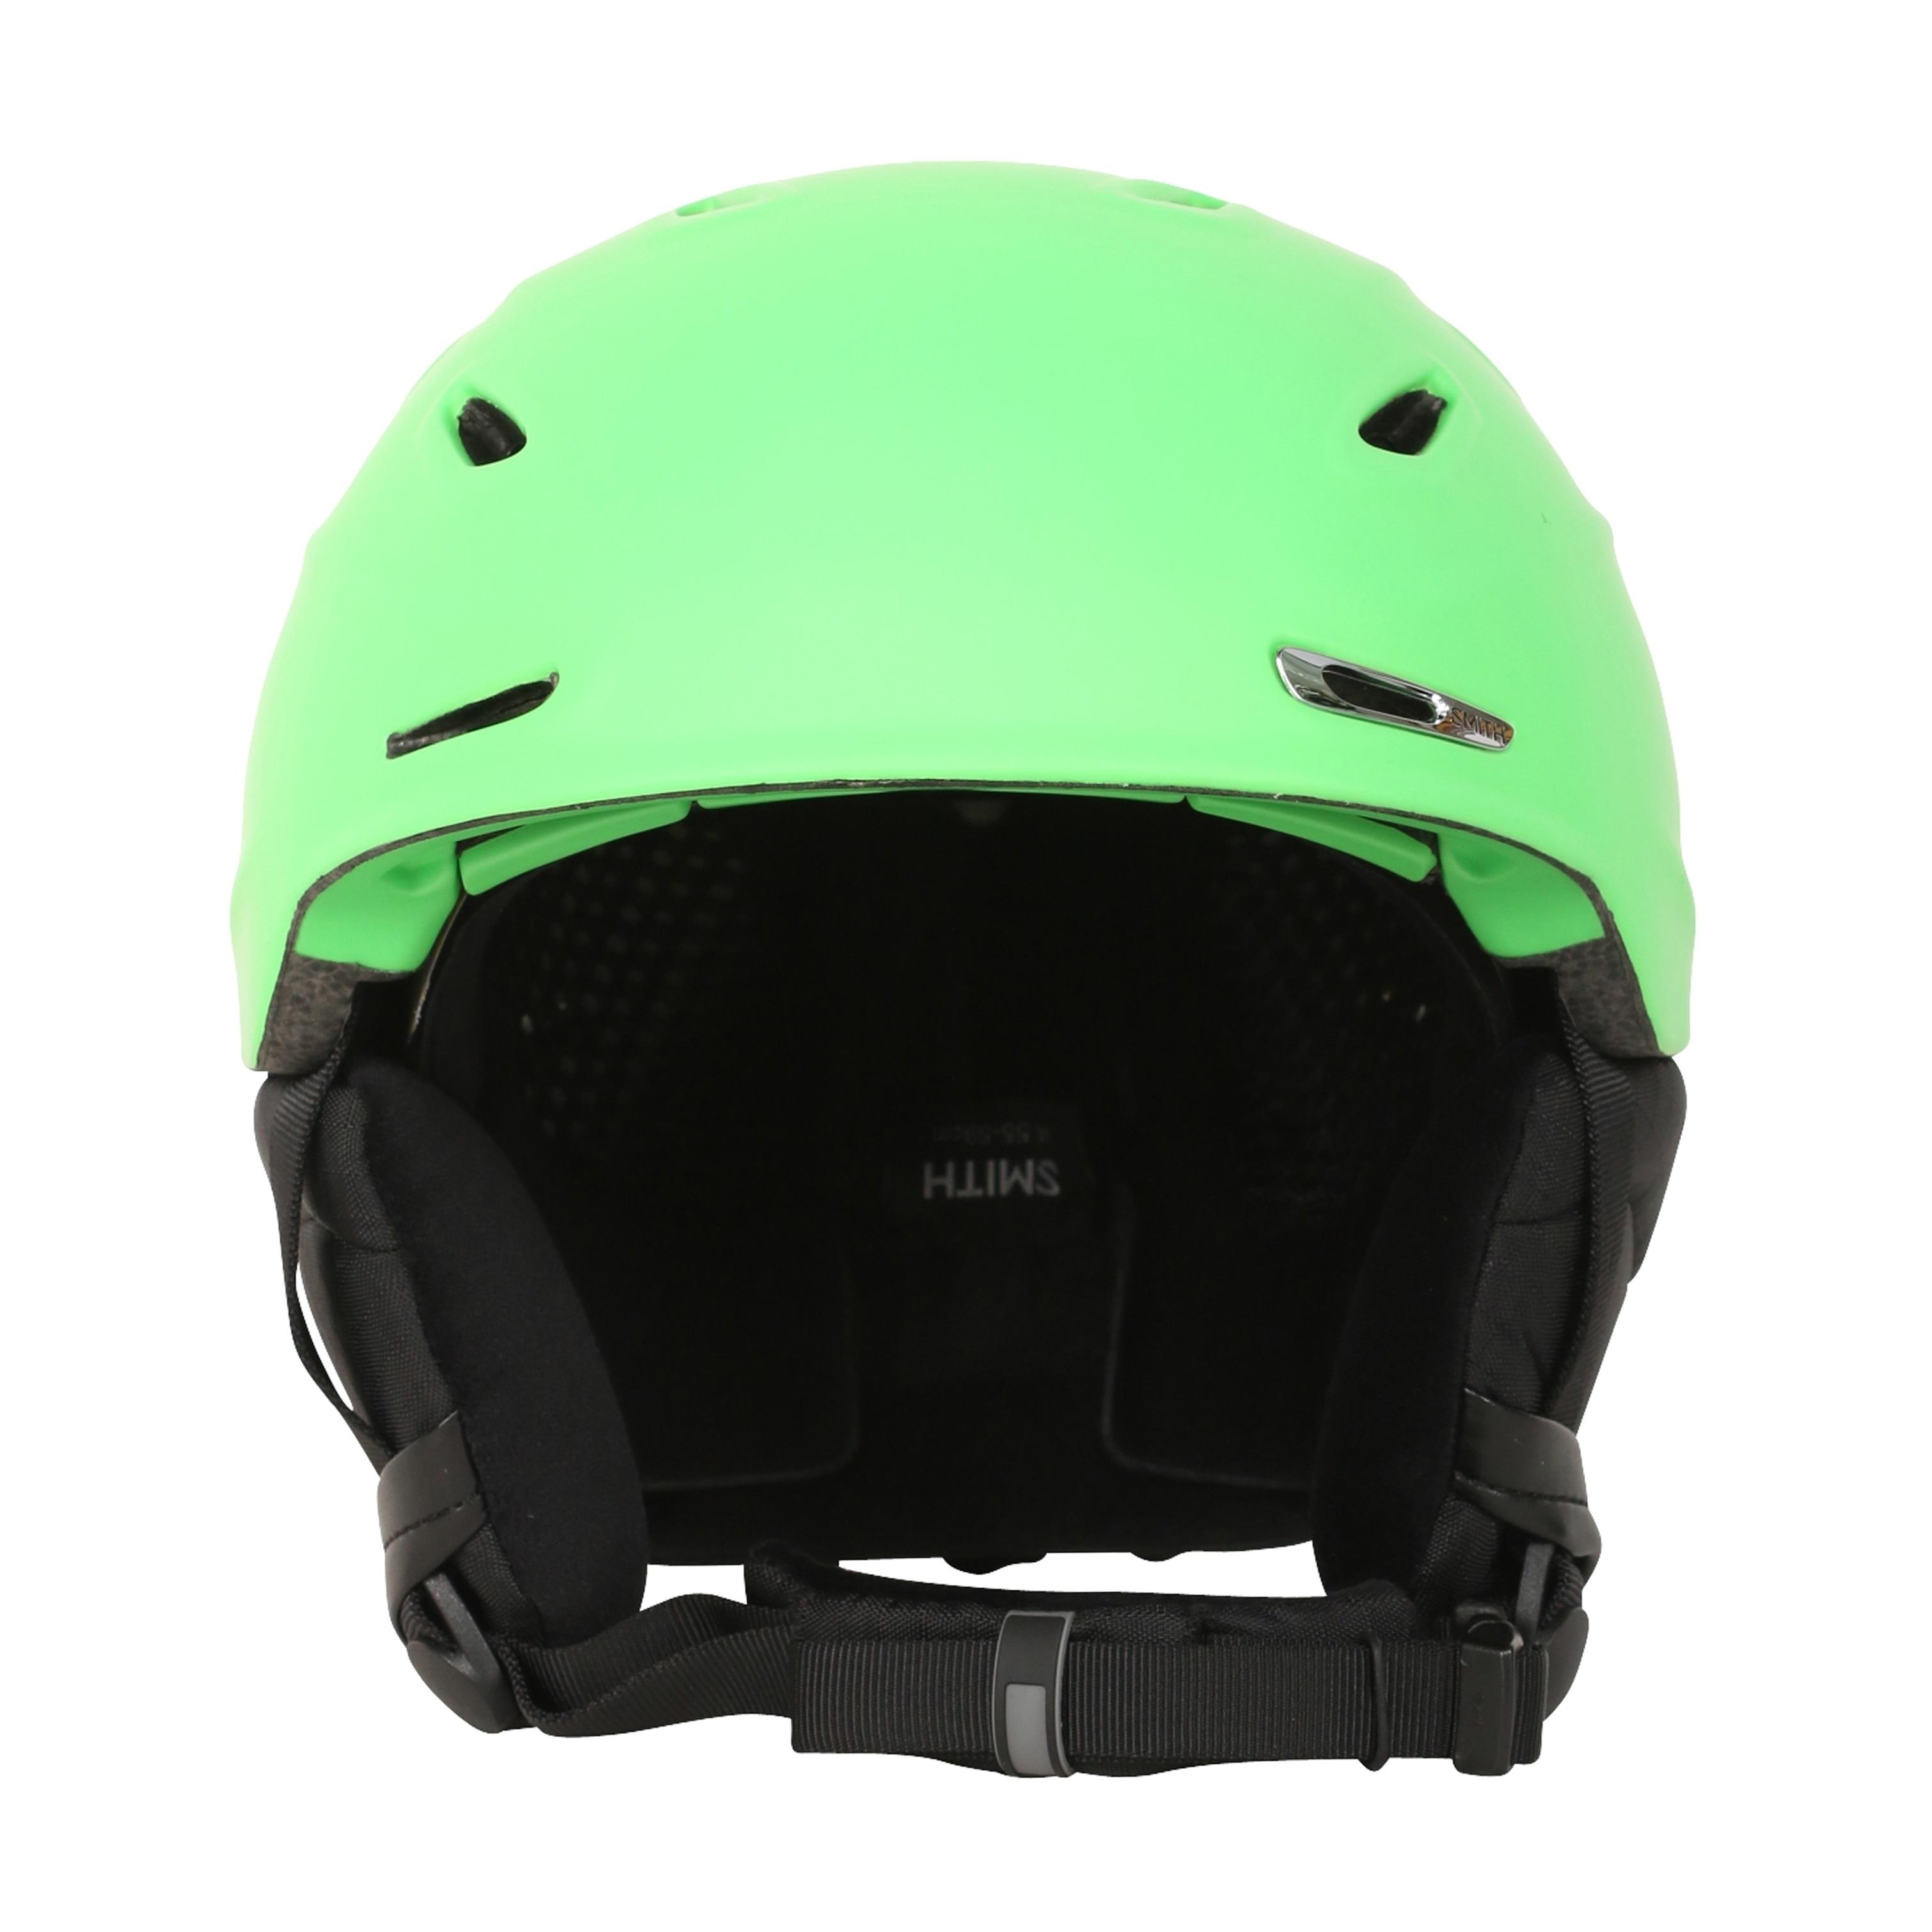 d5a123c975860 Shop Smith Optics Aspect Matte Reactor Split MIPS Ski Snowboard Helmet -  Green - Free Shipping Today - Overstock - 18076430